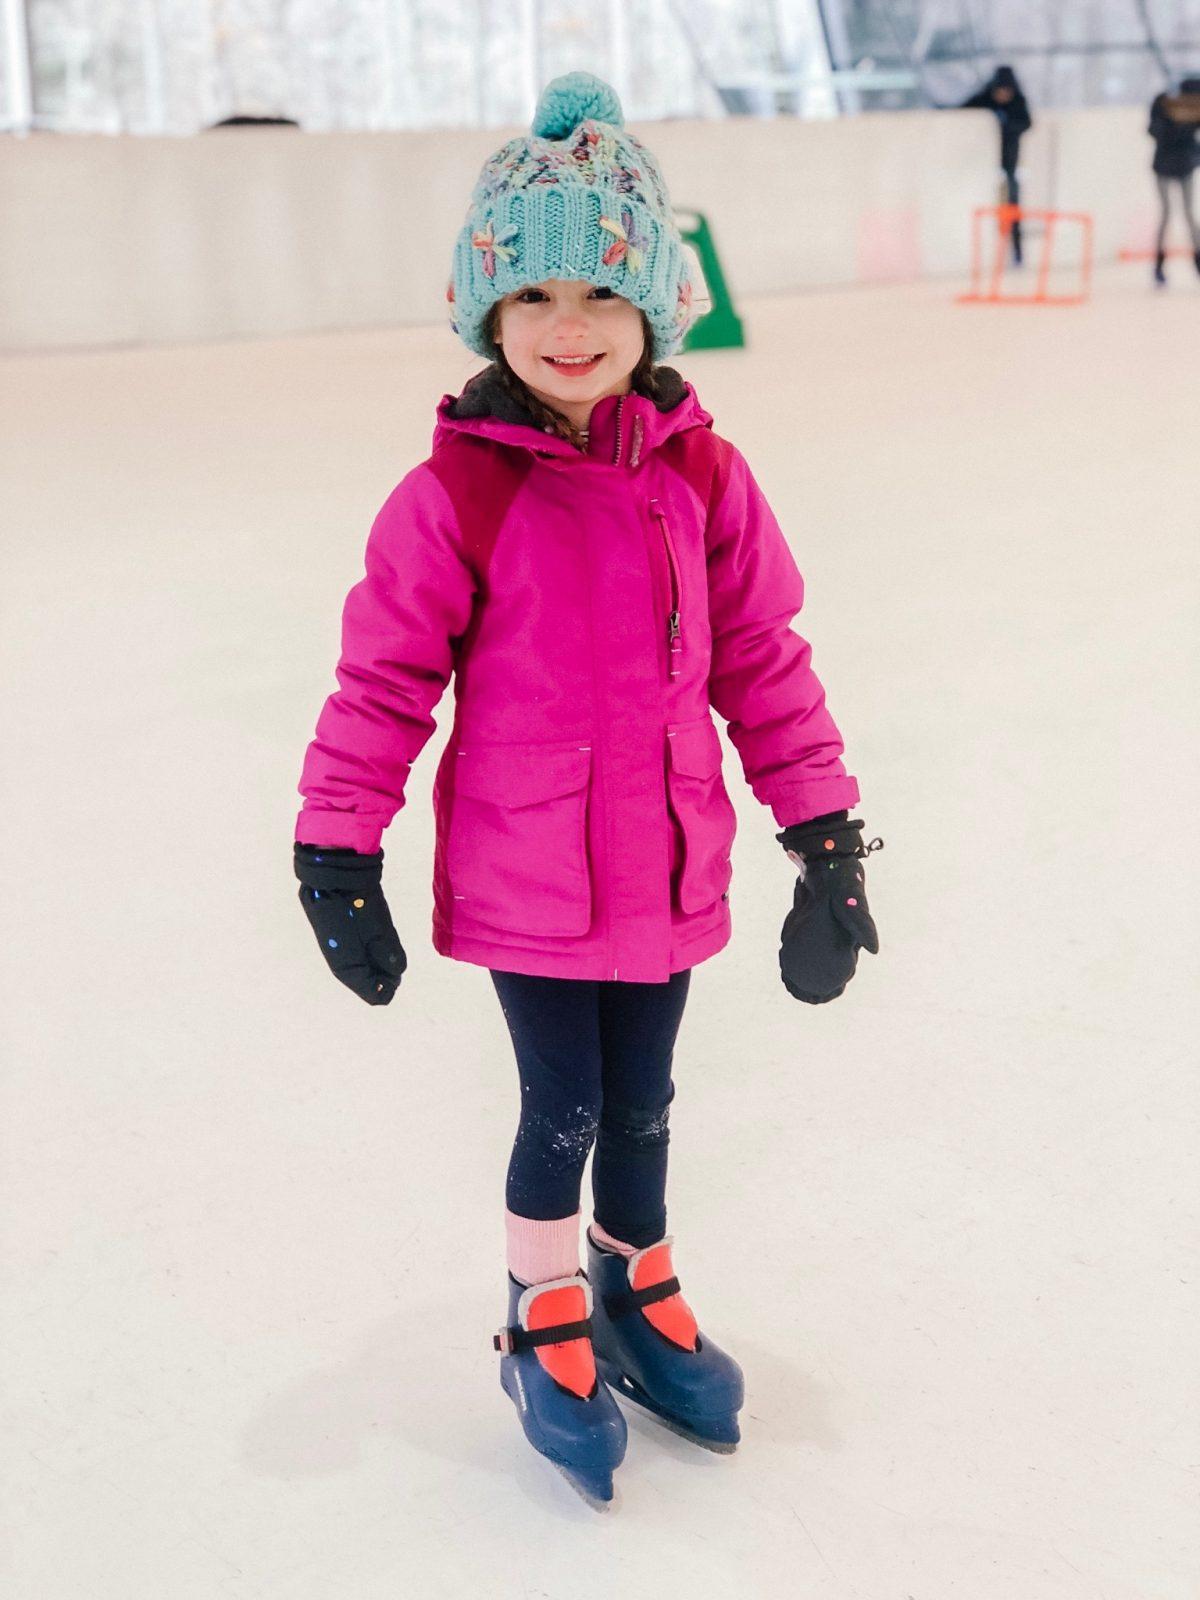 Little Girl wearing ice skates Woodloch Pines Resort in Pocono Mountains